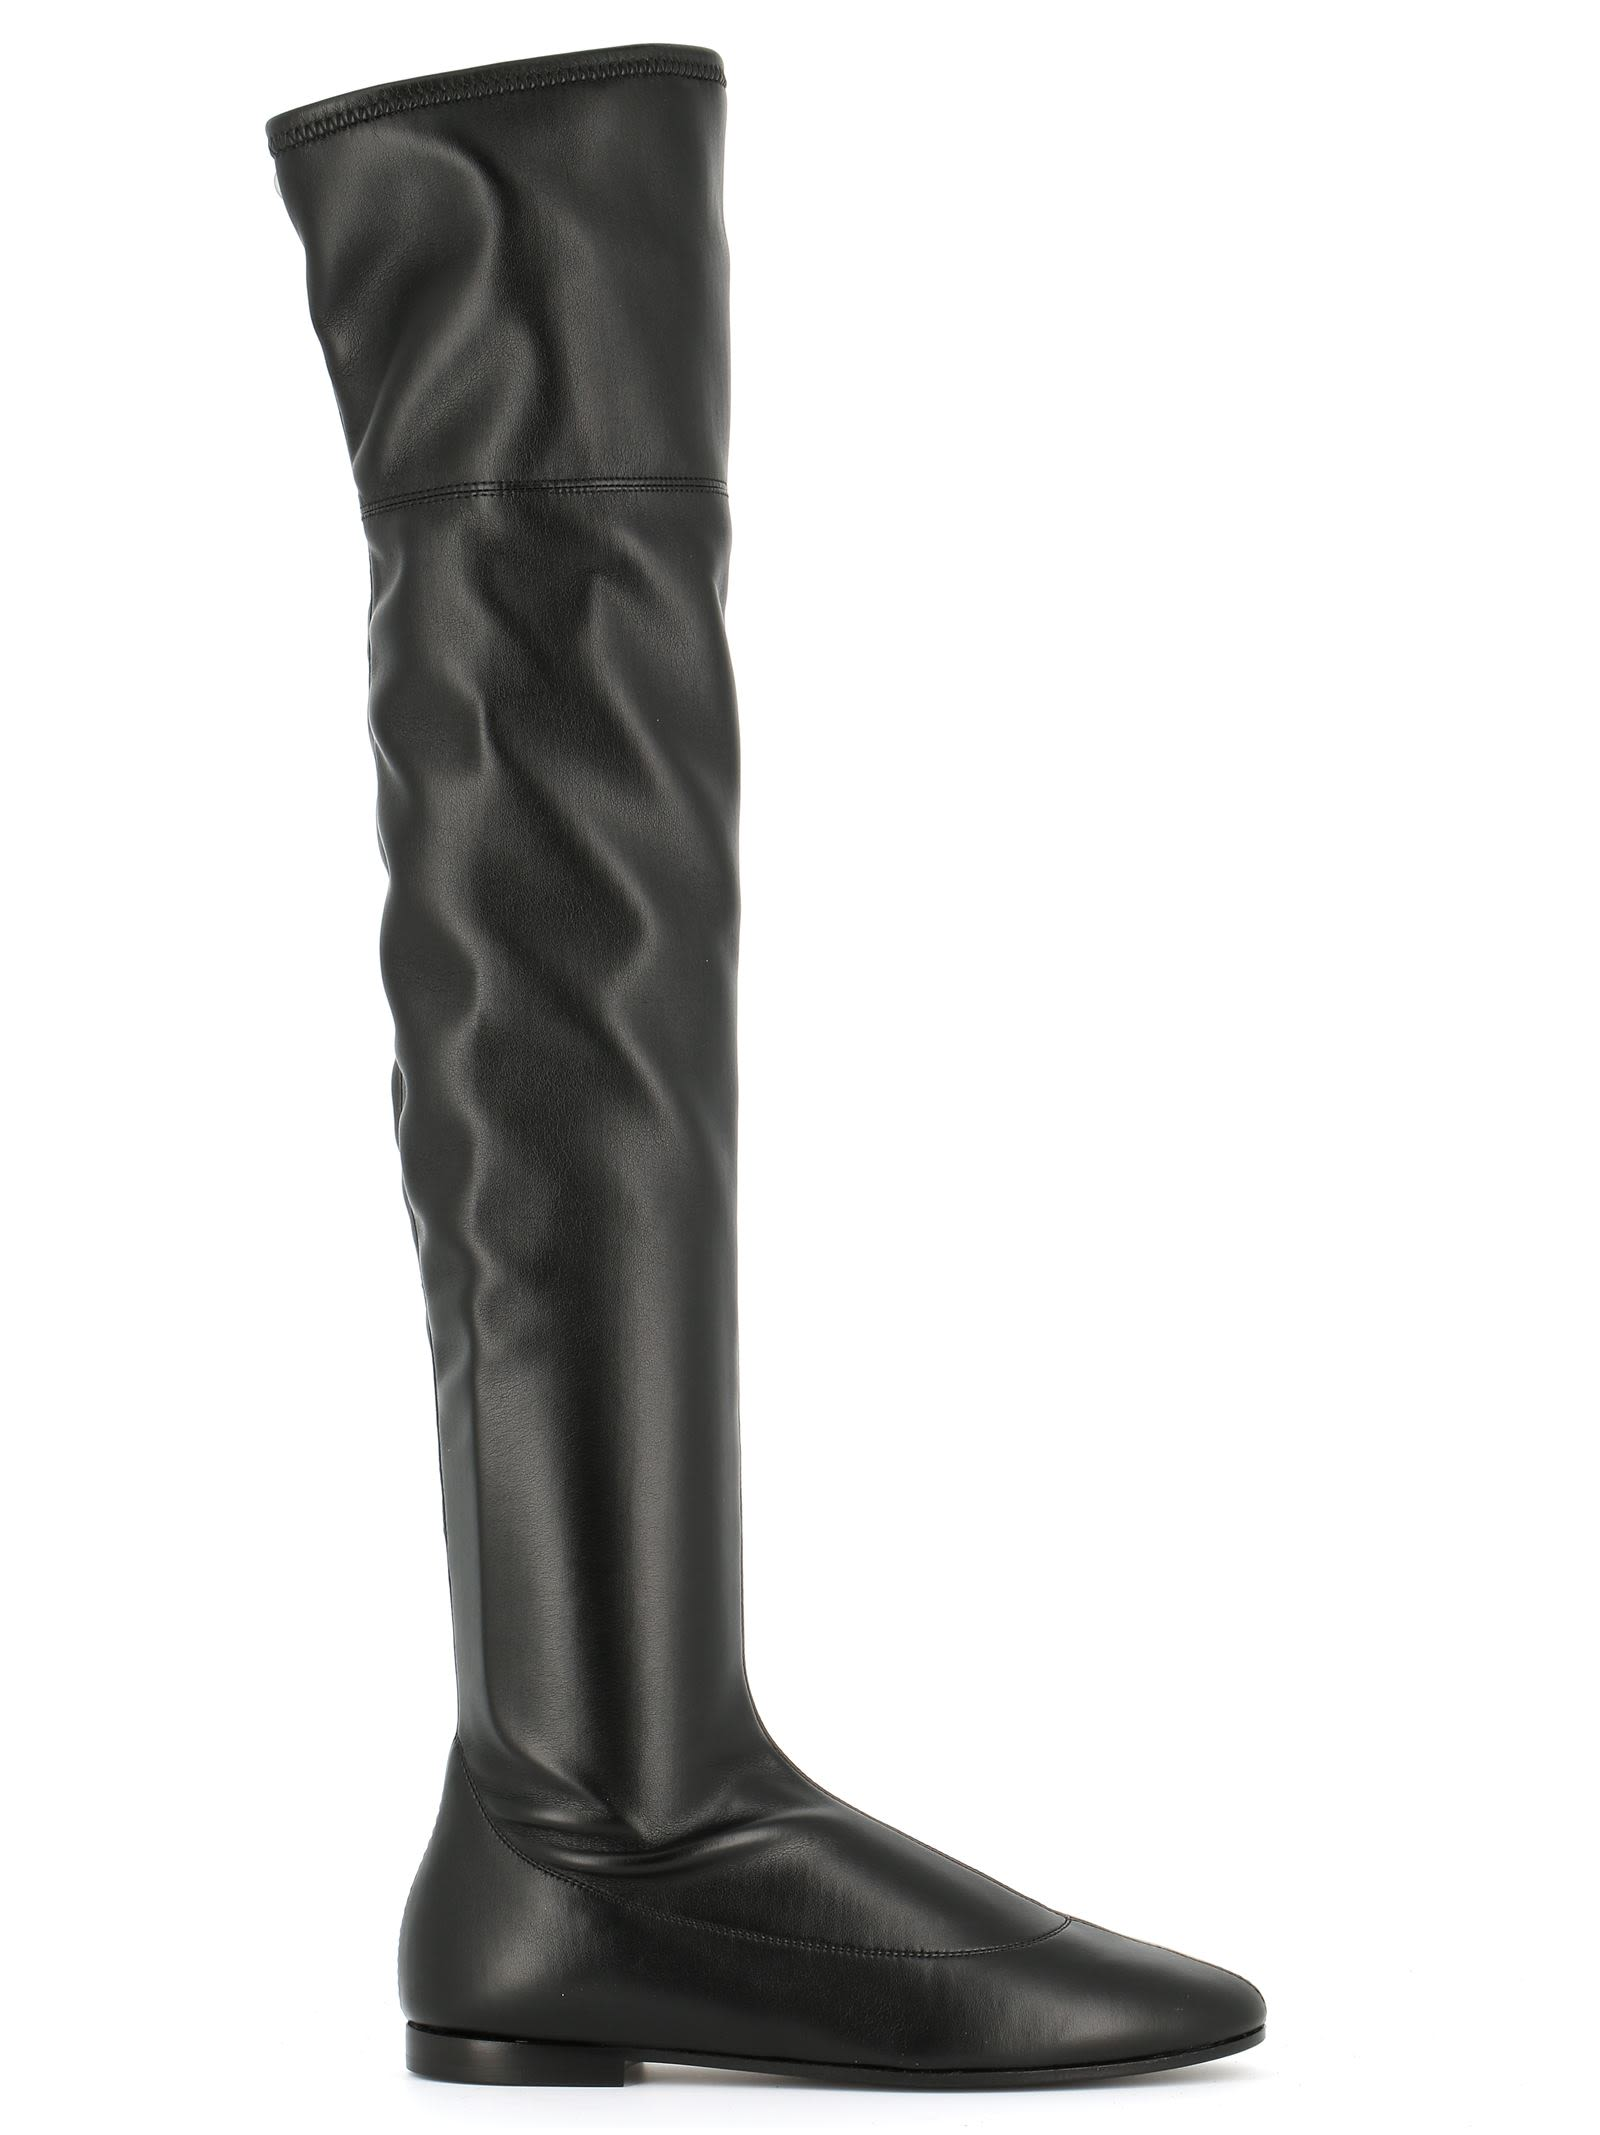 Giuseppe Zanotti sienna Over-the-knee Boots Boot